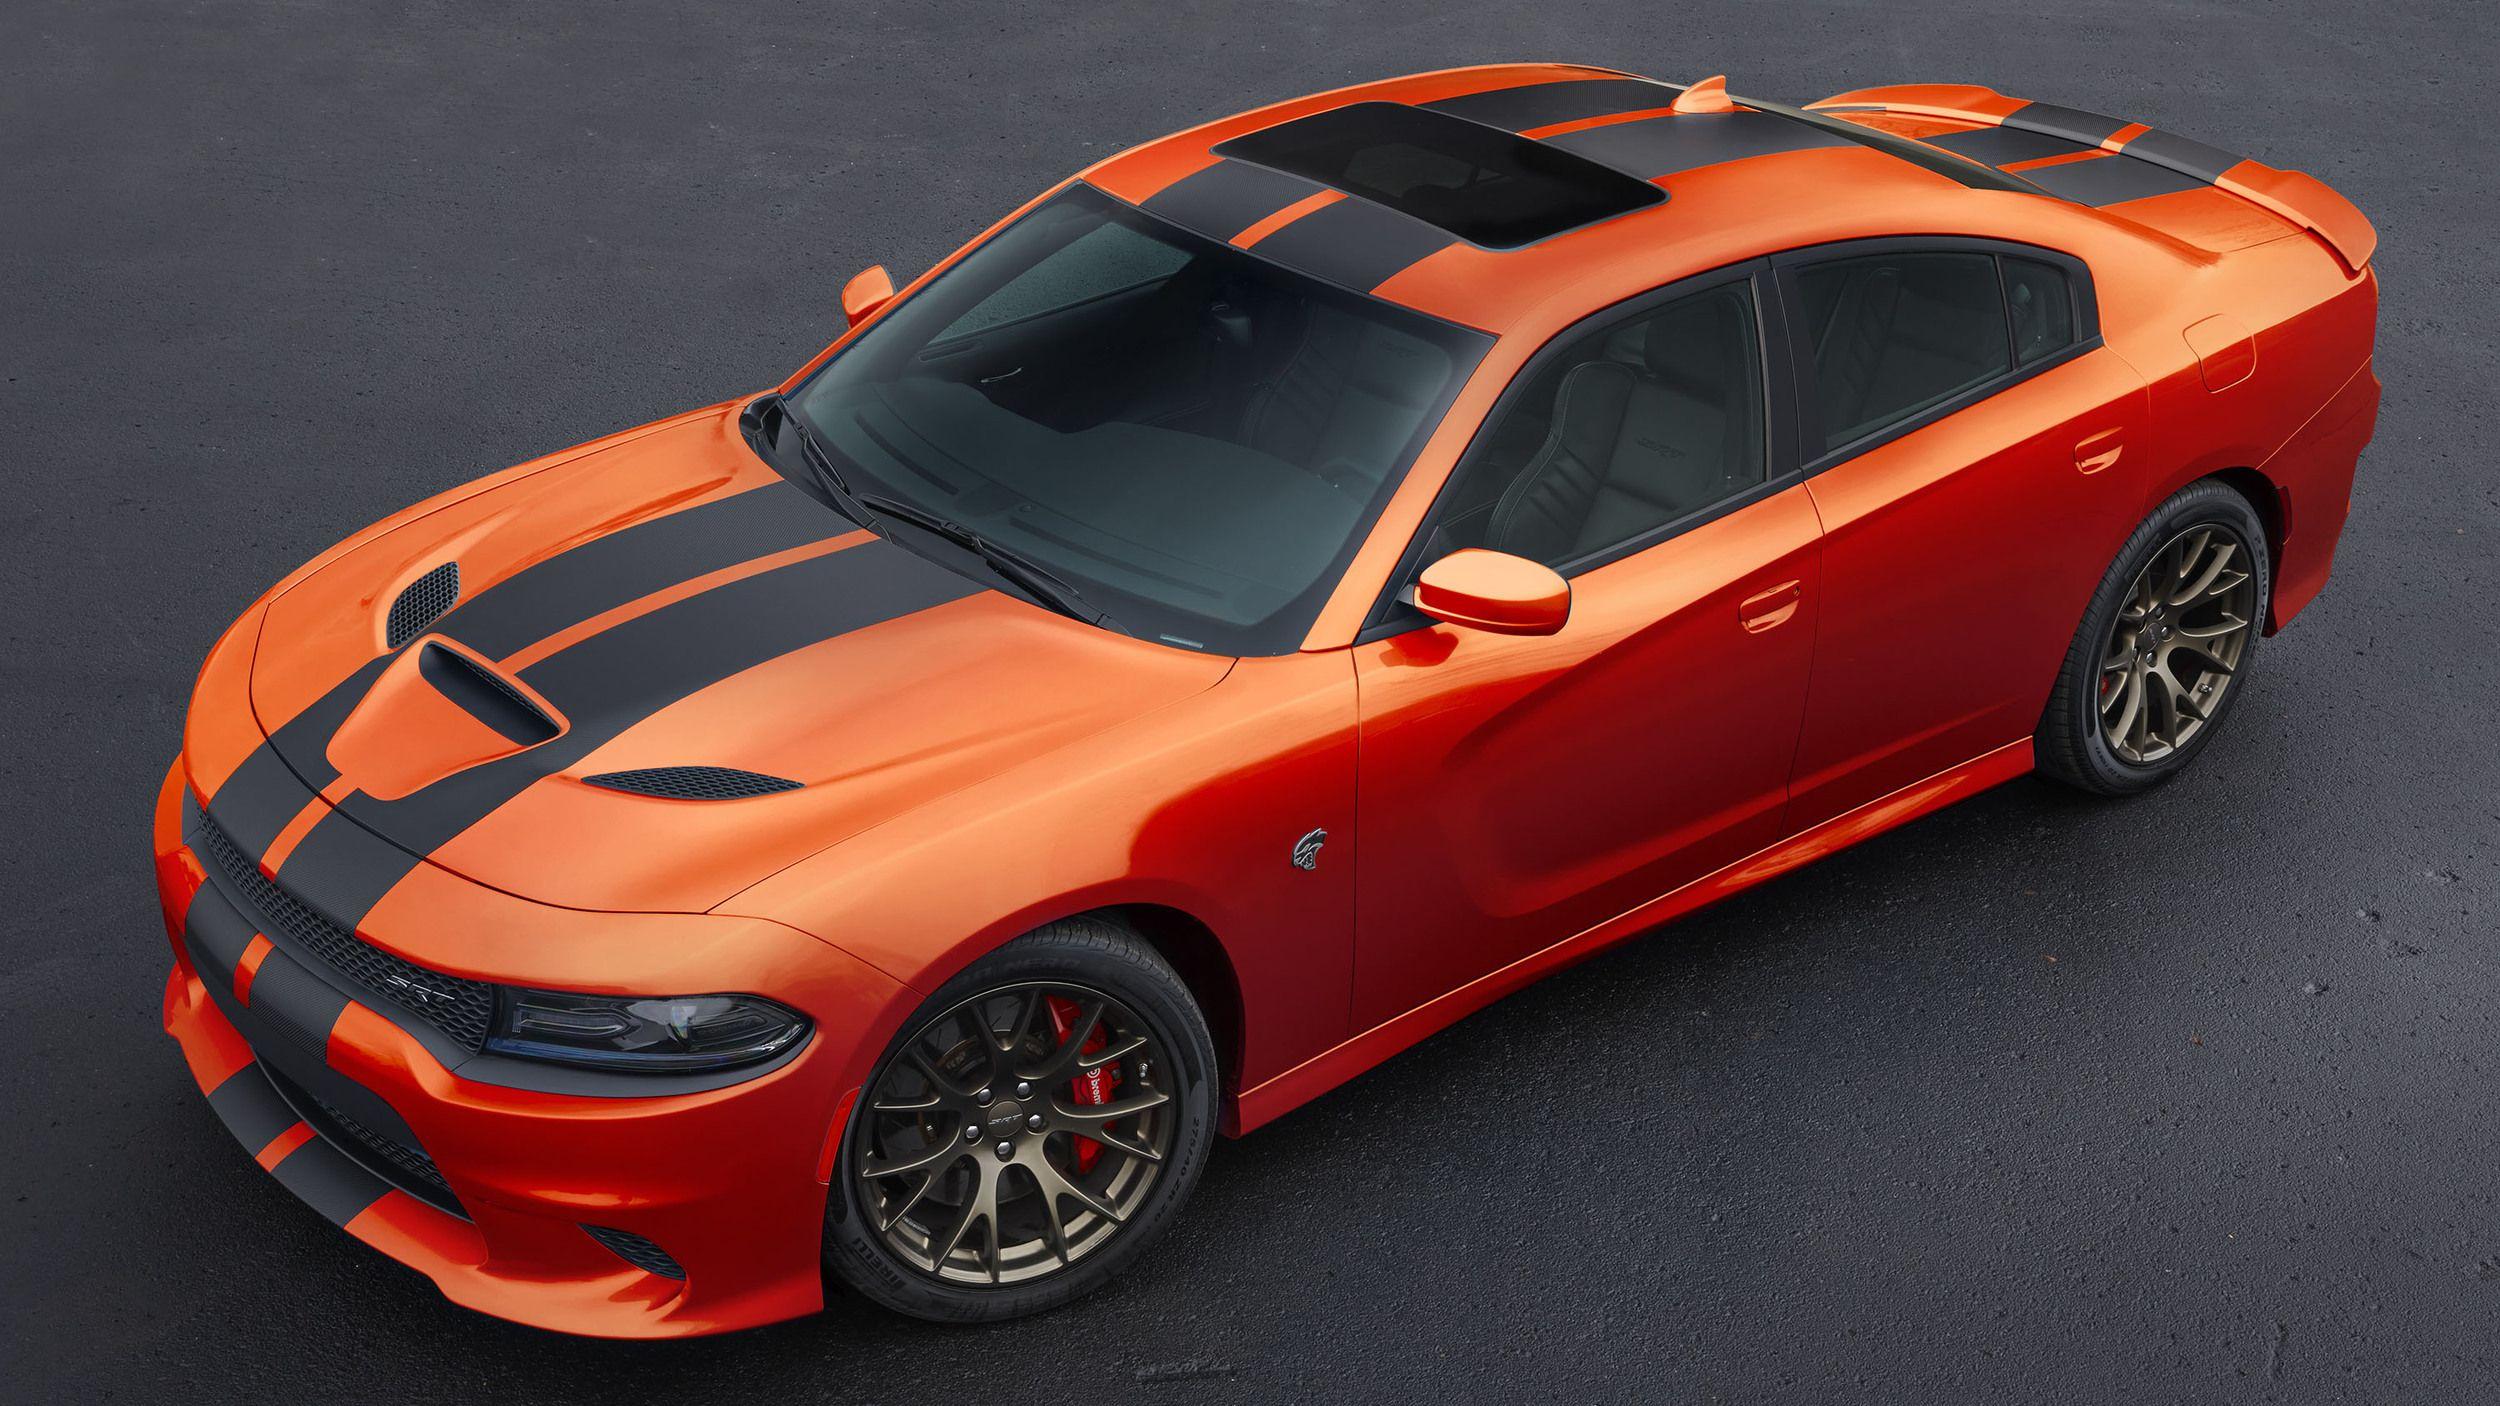 A Mango Orange Dodge Charger We Love It Drivebuys Dodge Charger Hellcat Dodge Charger Charger Srt